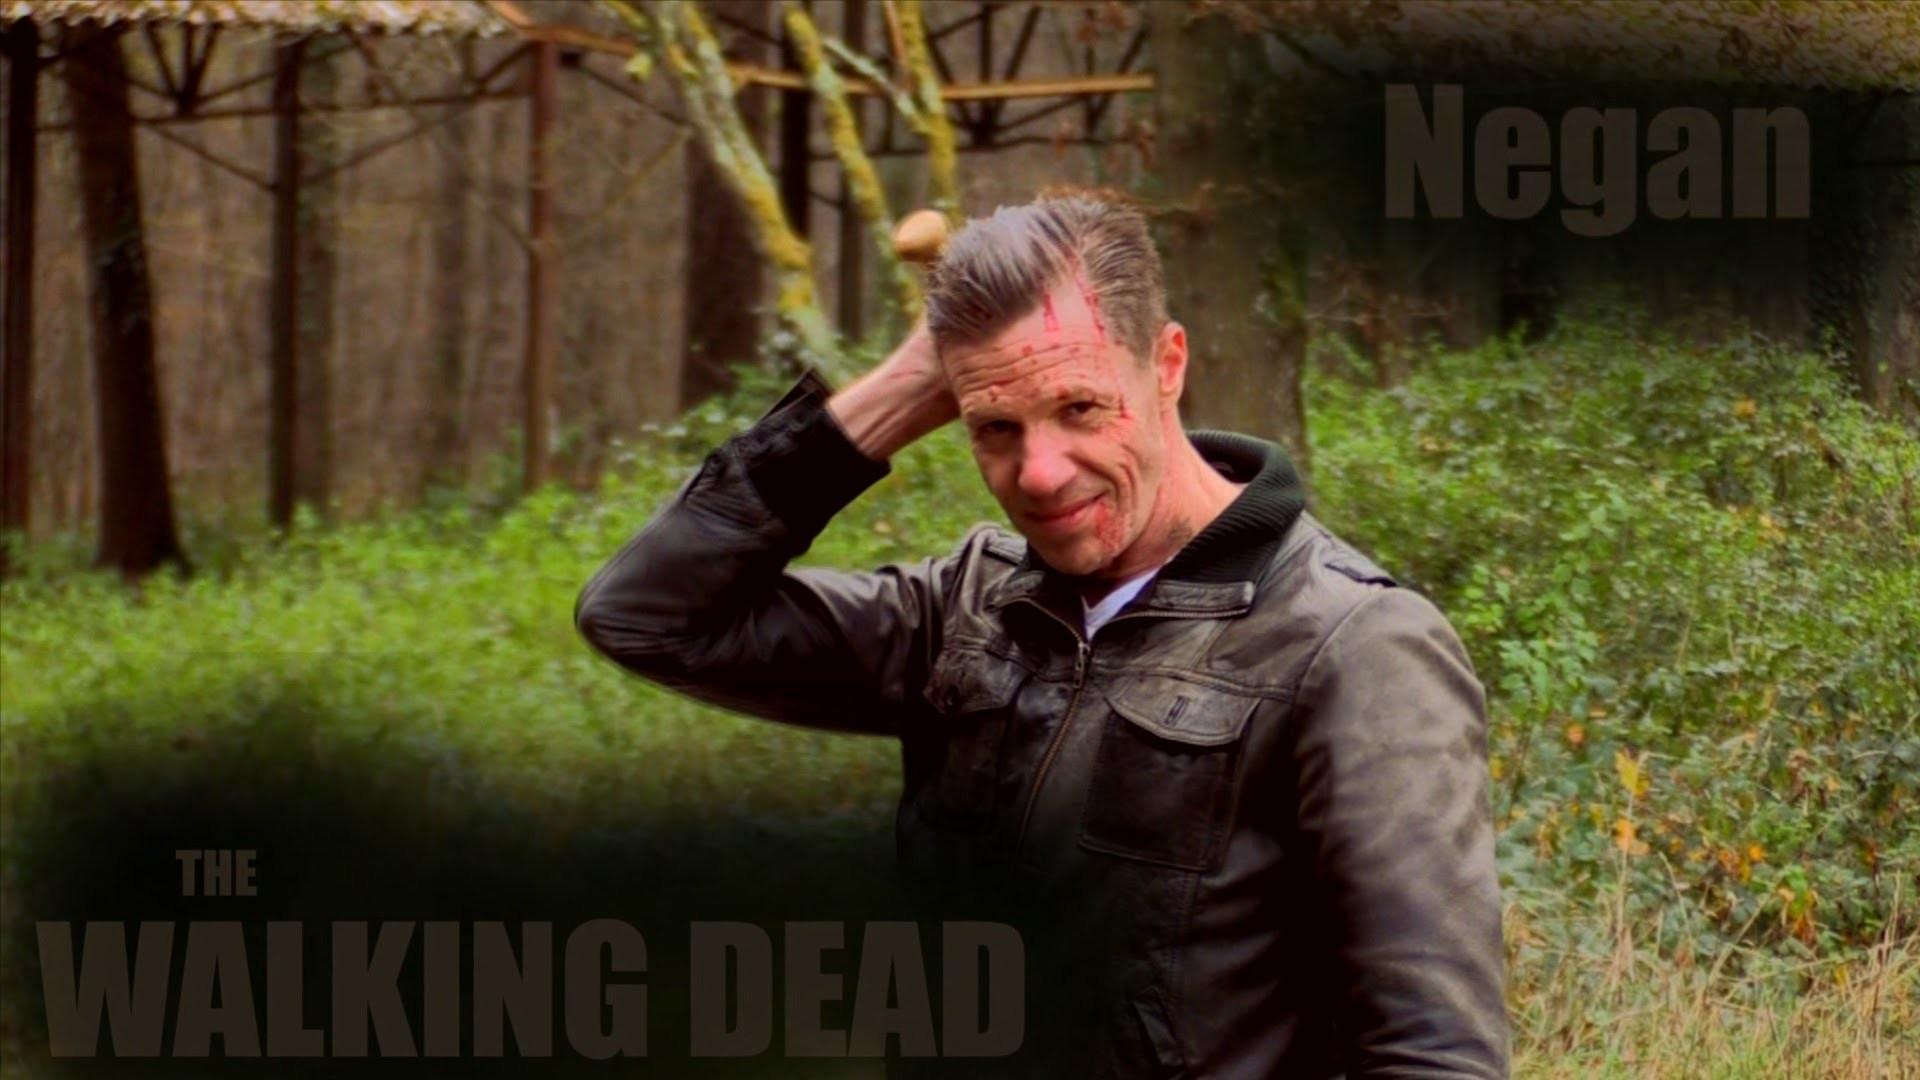 Negan wallpaper  Download free stunning full HD